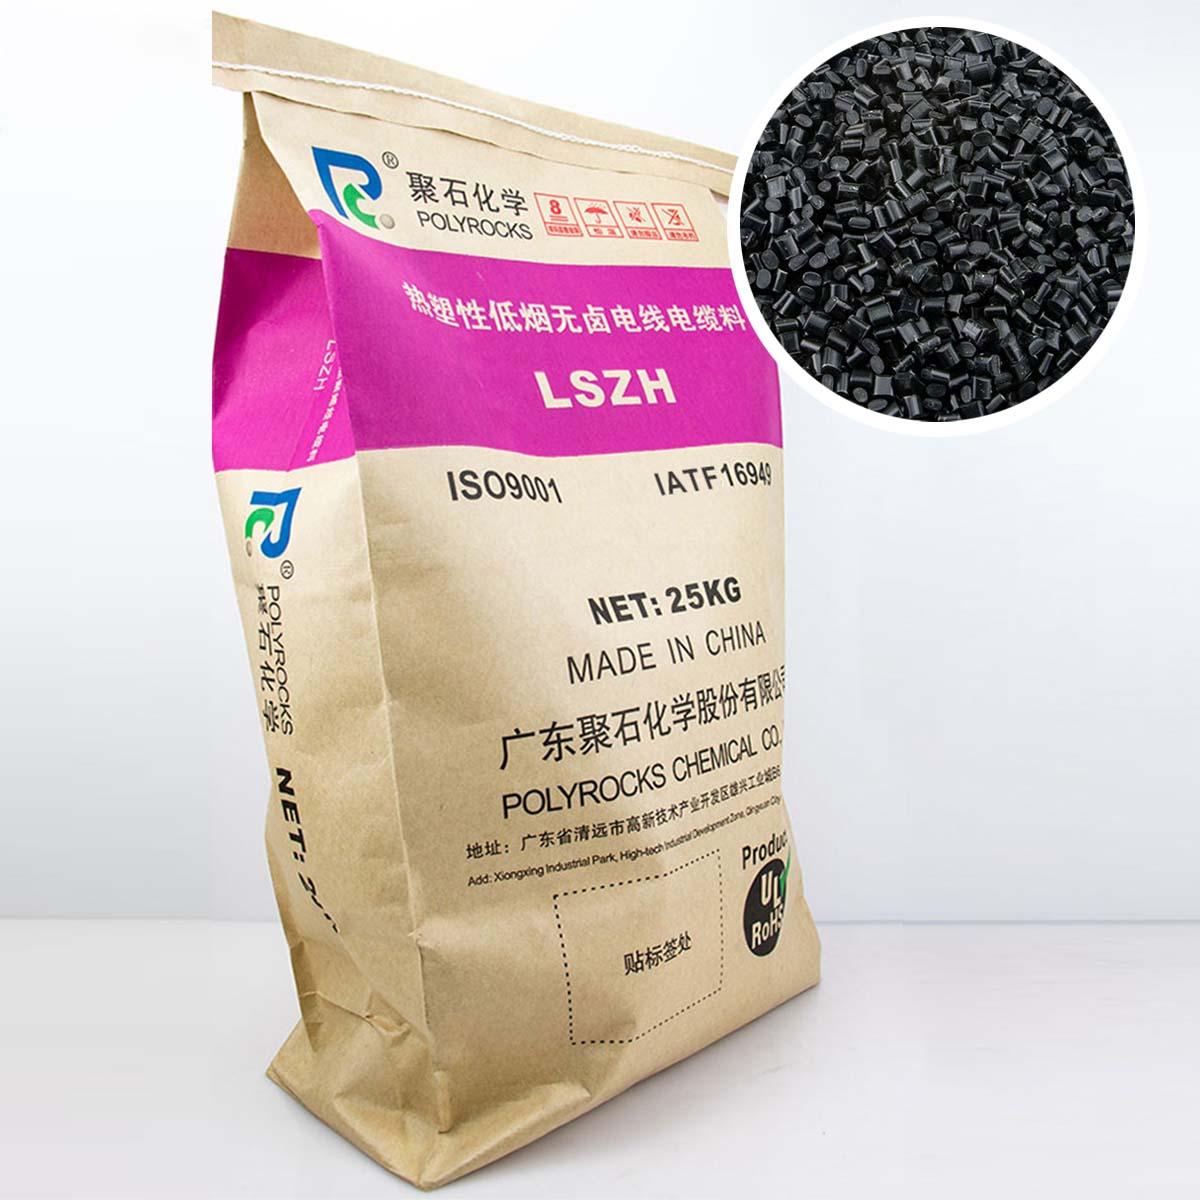 LSZH(黑色粒子).jpg